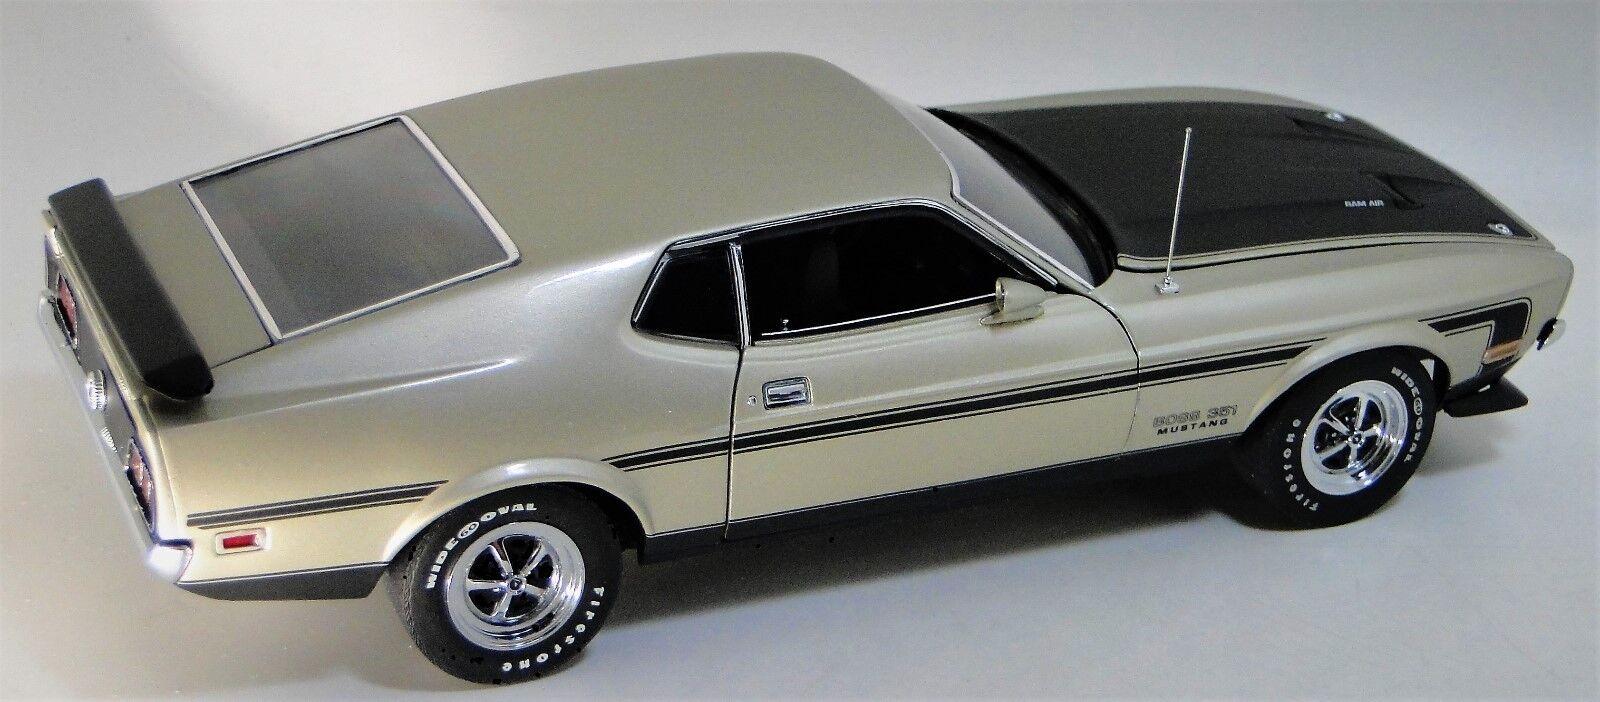 1 1970er mustang gt - rennwagen 24 jahrgang 18 karussell - sport - modell mit 12 40